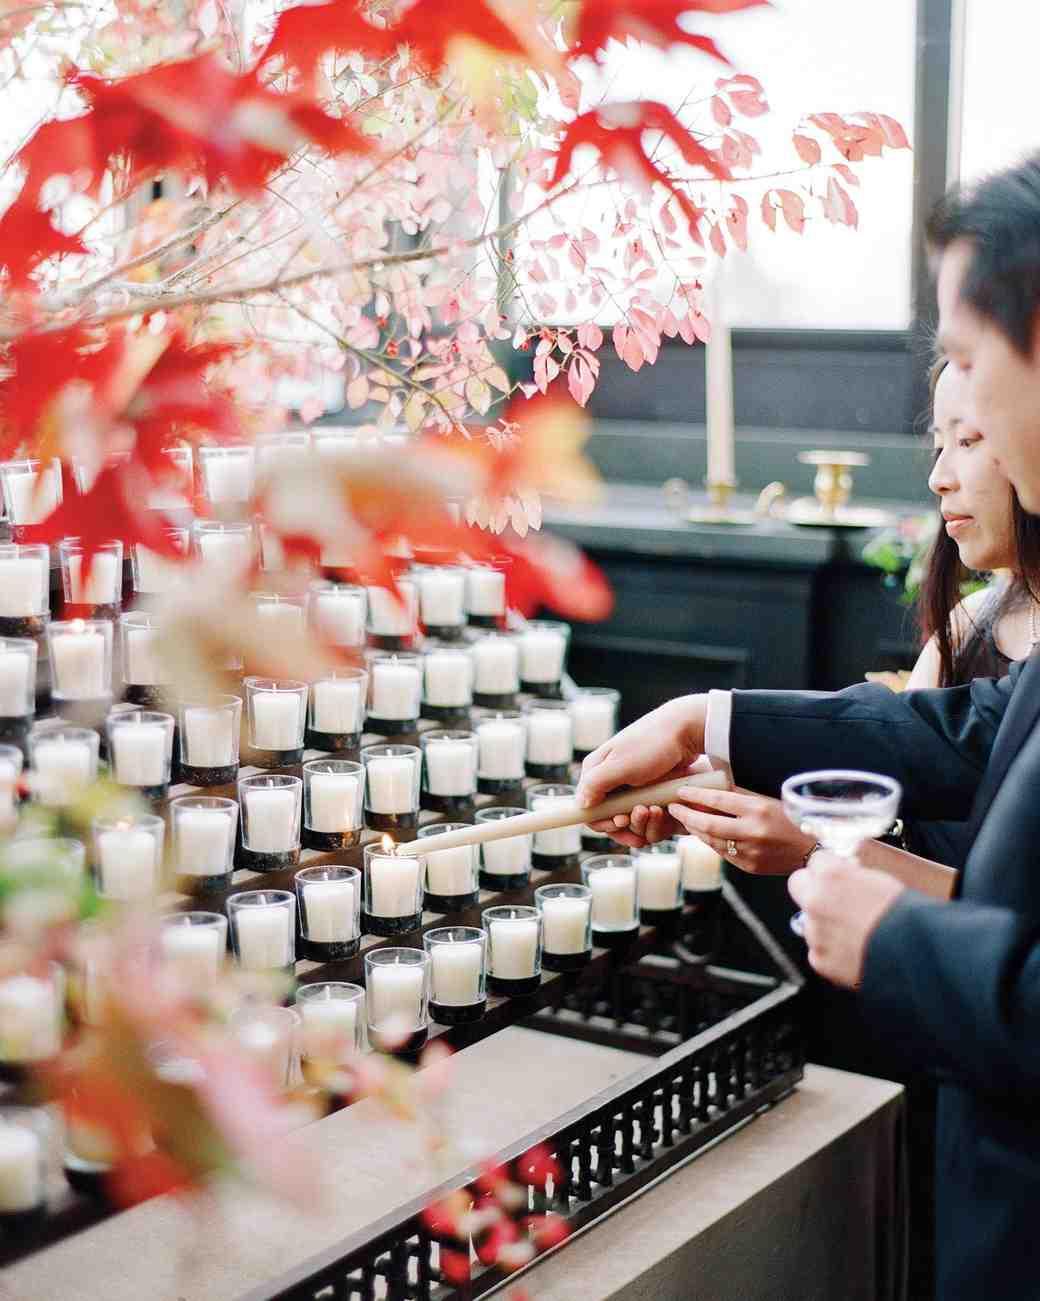 glara matthew wedding candle wishes